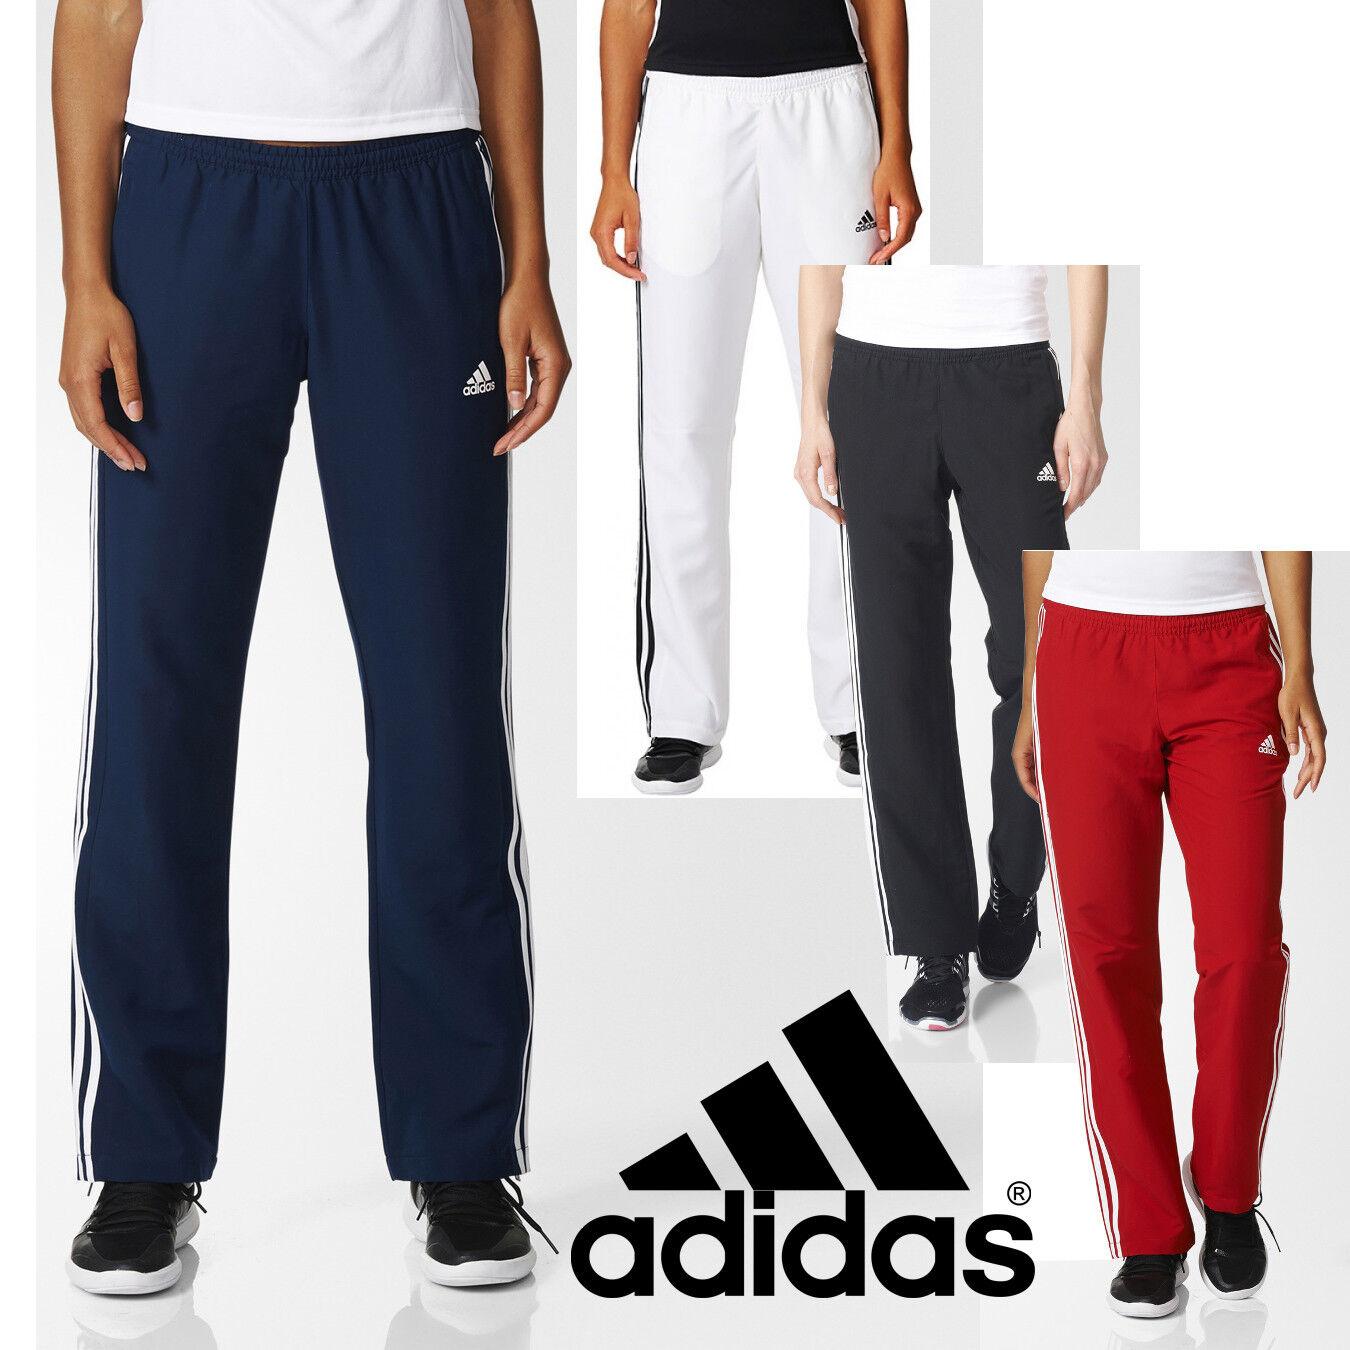 adidas pants sale